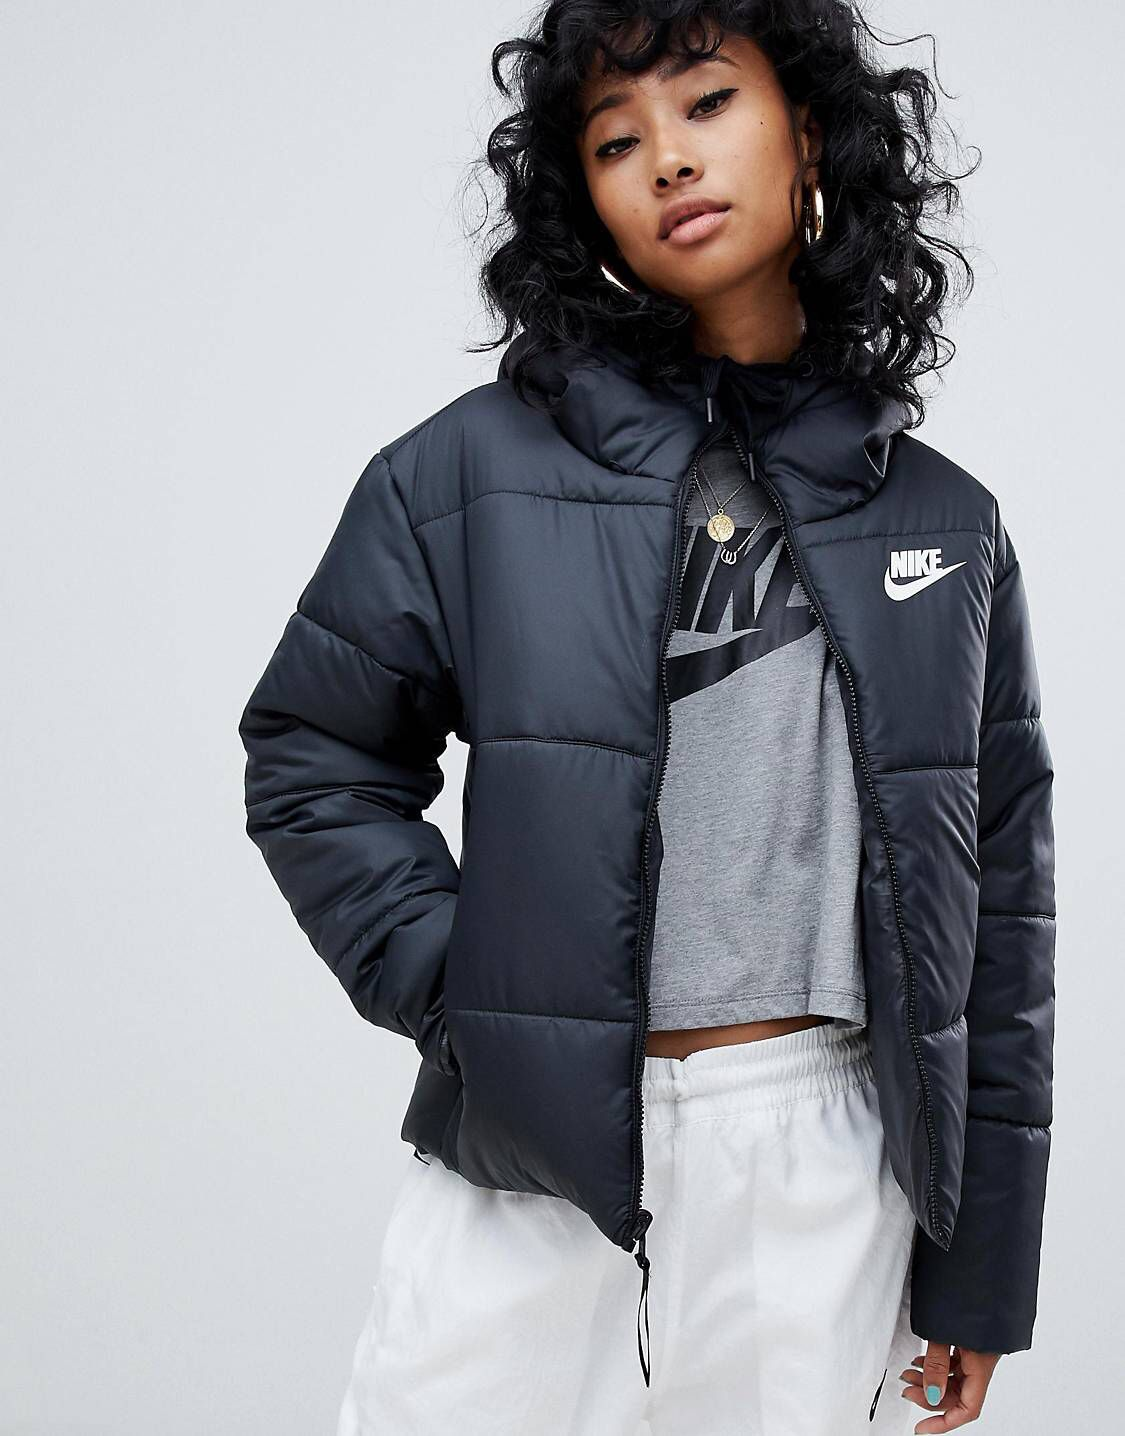 Nike Puffy Jacket Medium 155 Nike Jackets Women Rain Jackets Outfit Nike Coat Jackets [ 1436 x 1125 Pixel ]